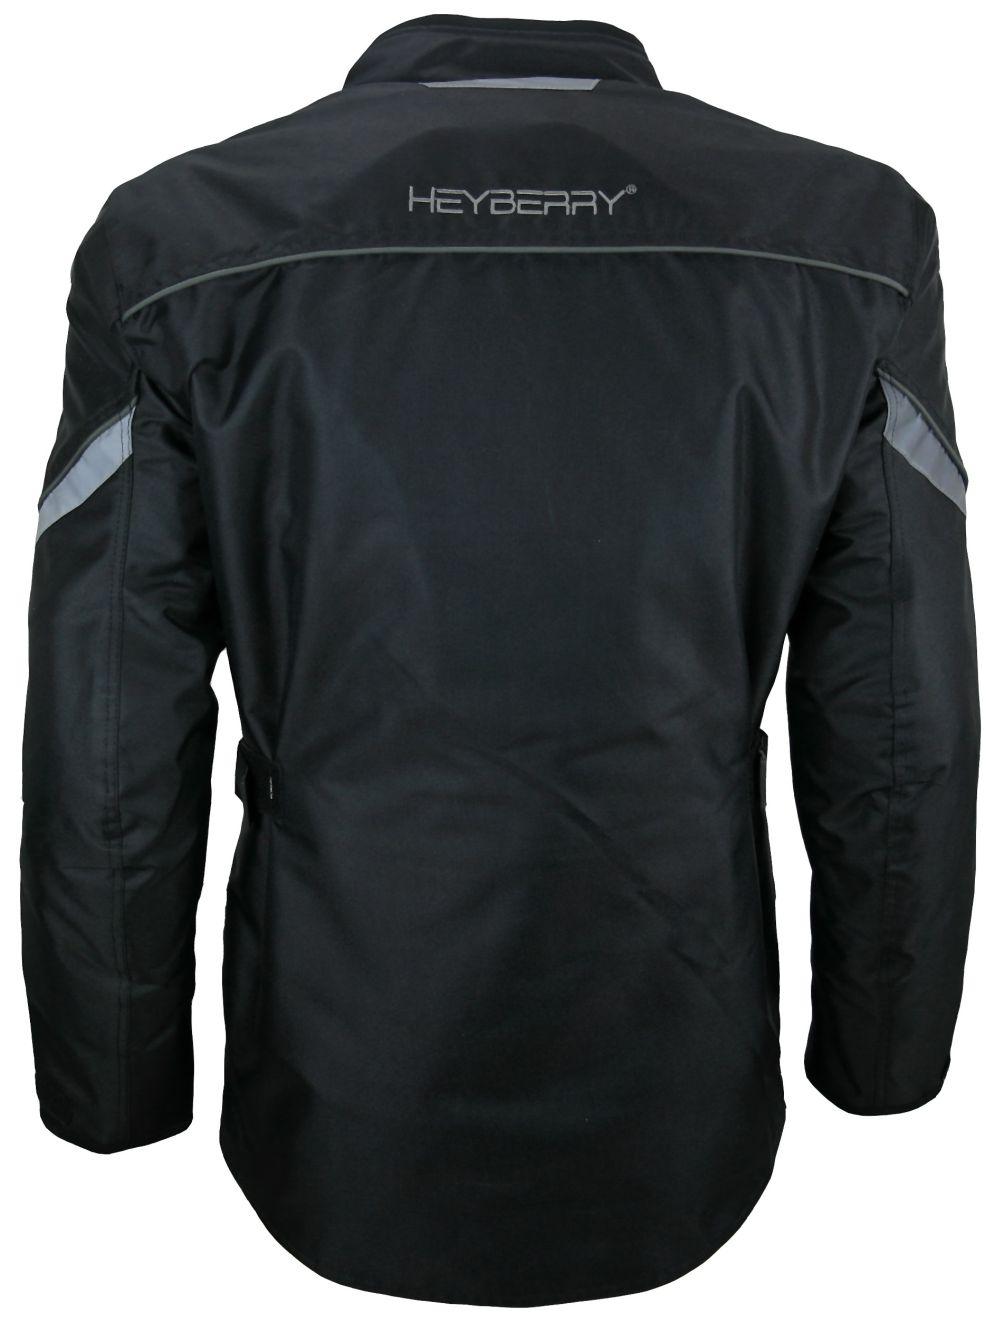 Heyberry Textil Touren Motorradjacke Motorrad Jacke schwarz grau Gr. M-3XL